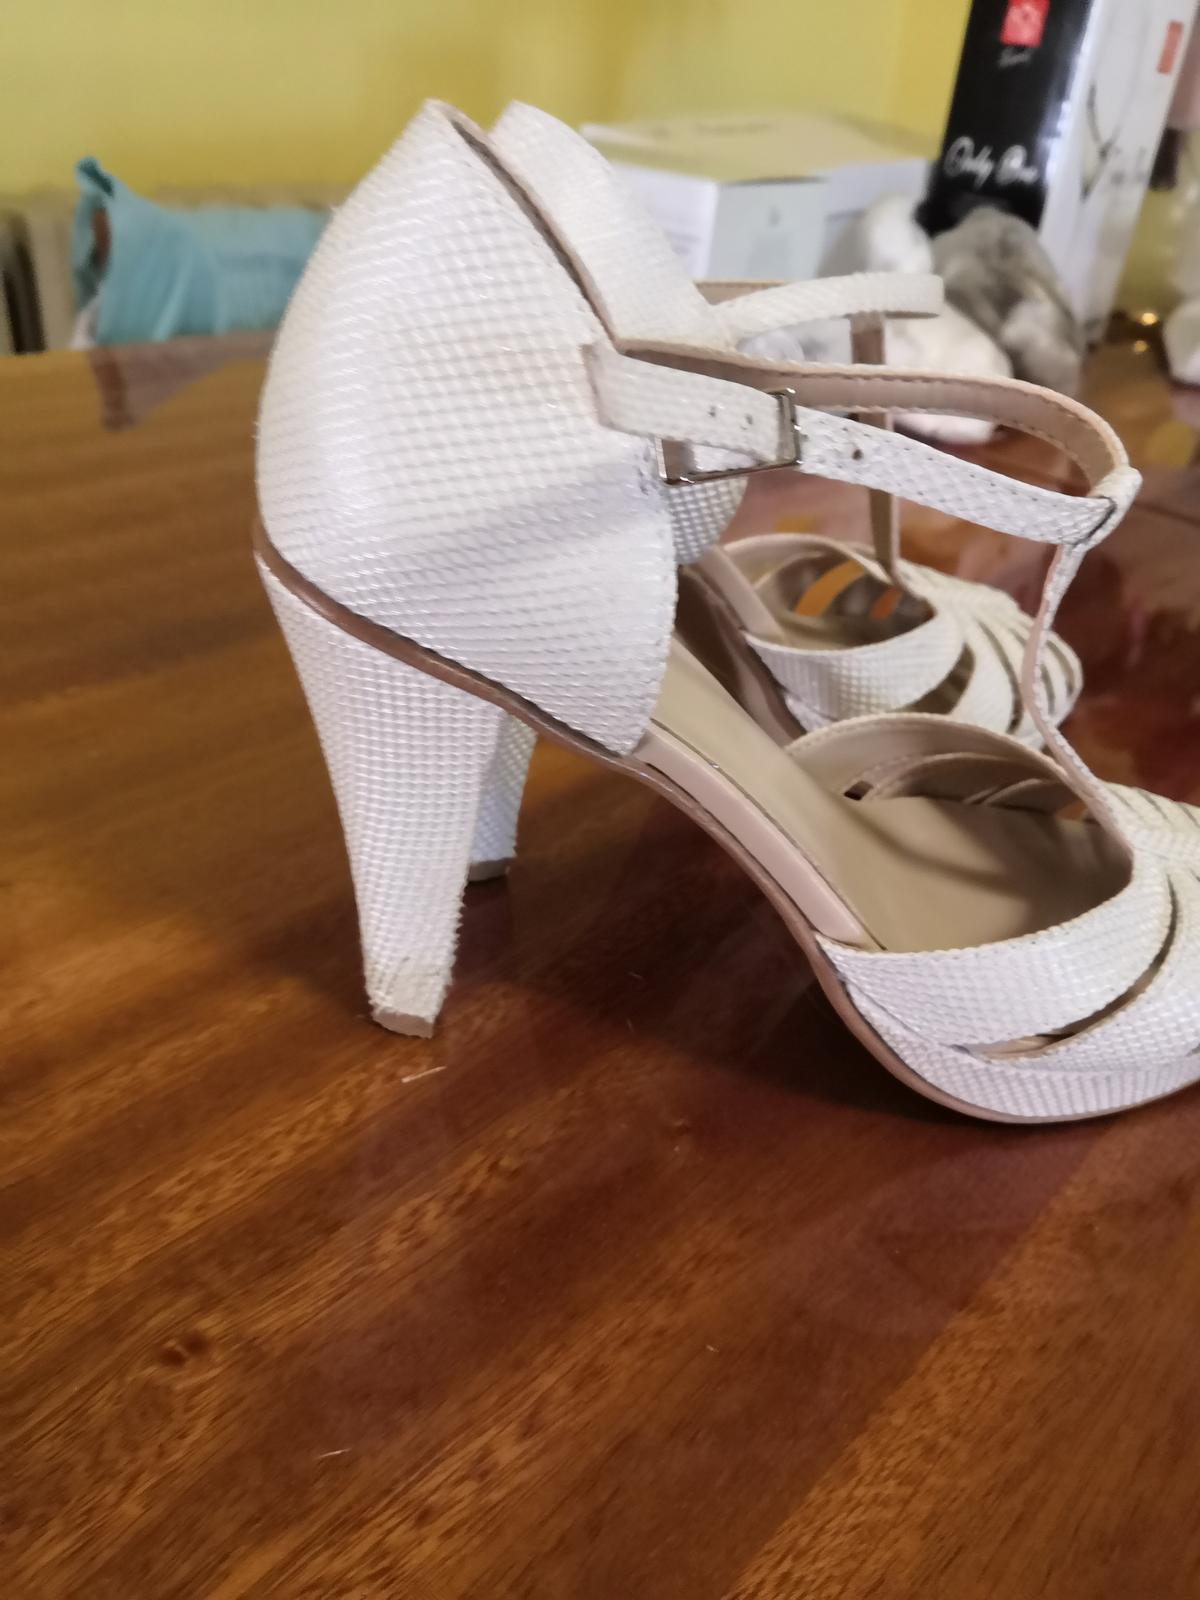 Svadobné sandálky - Obrázok č. 2